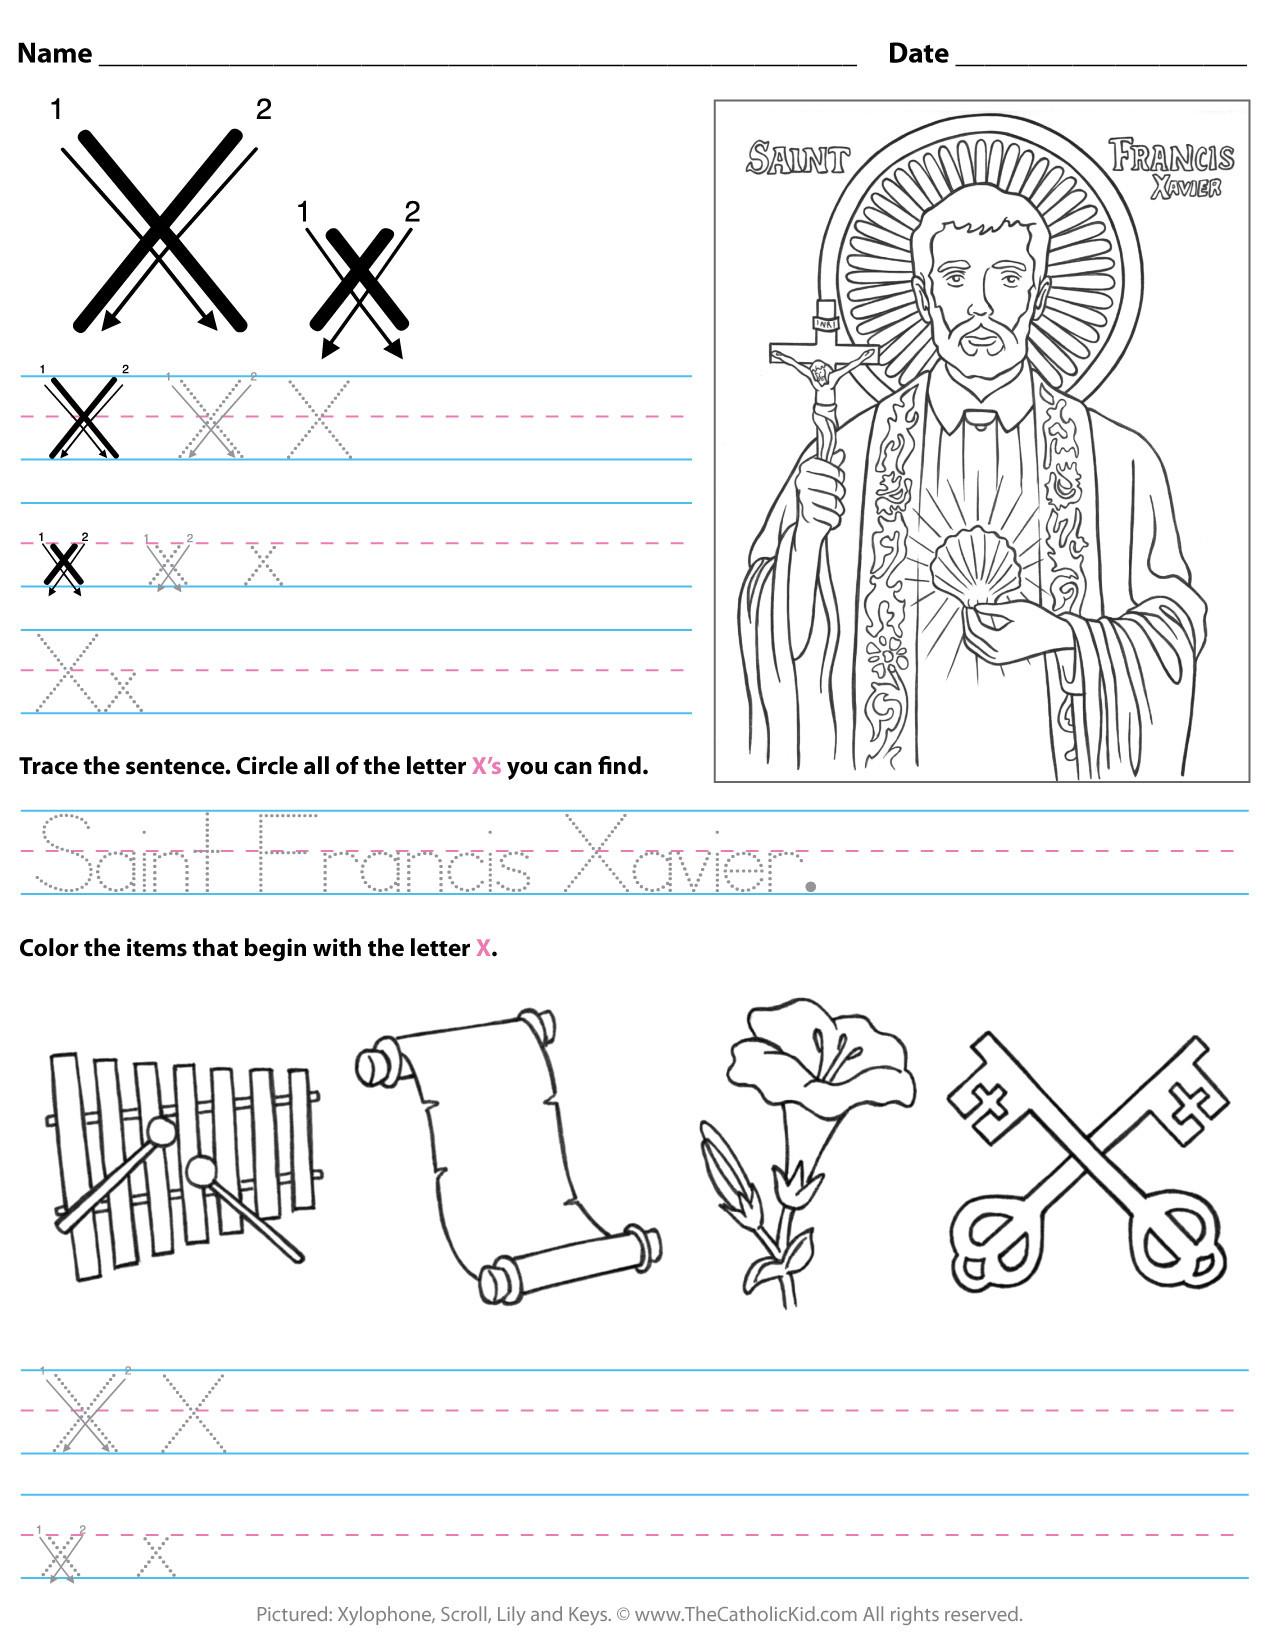 Letter X Worksheets for Preschoolers Catholic Alphabet Letter X Worksheet Preschool Kindergarten